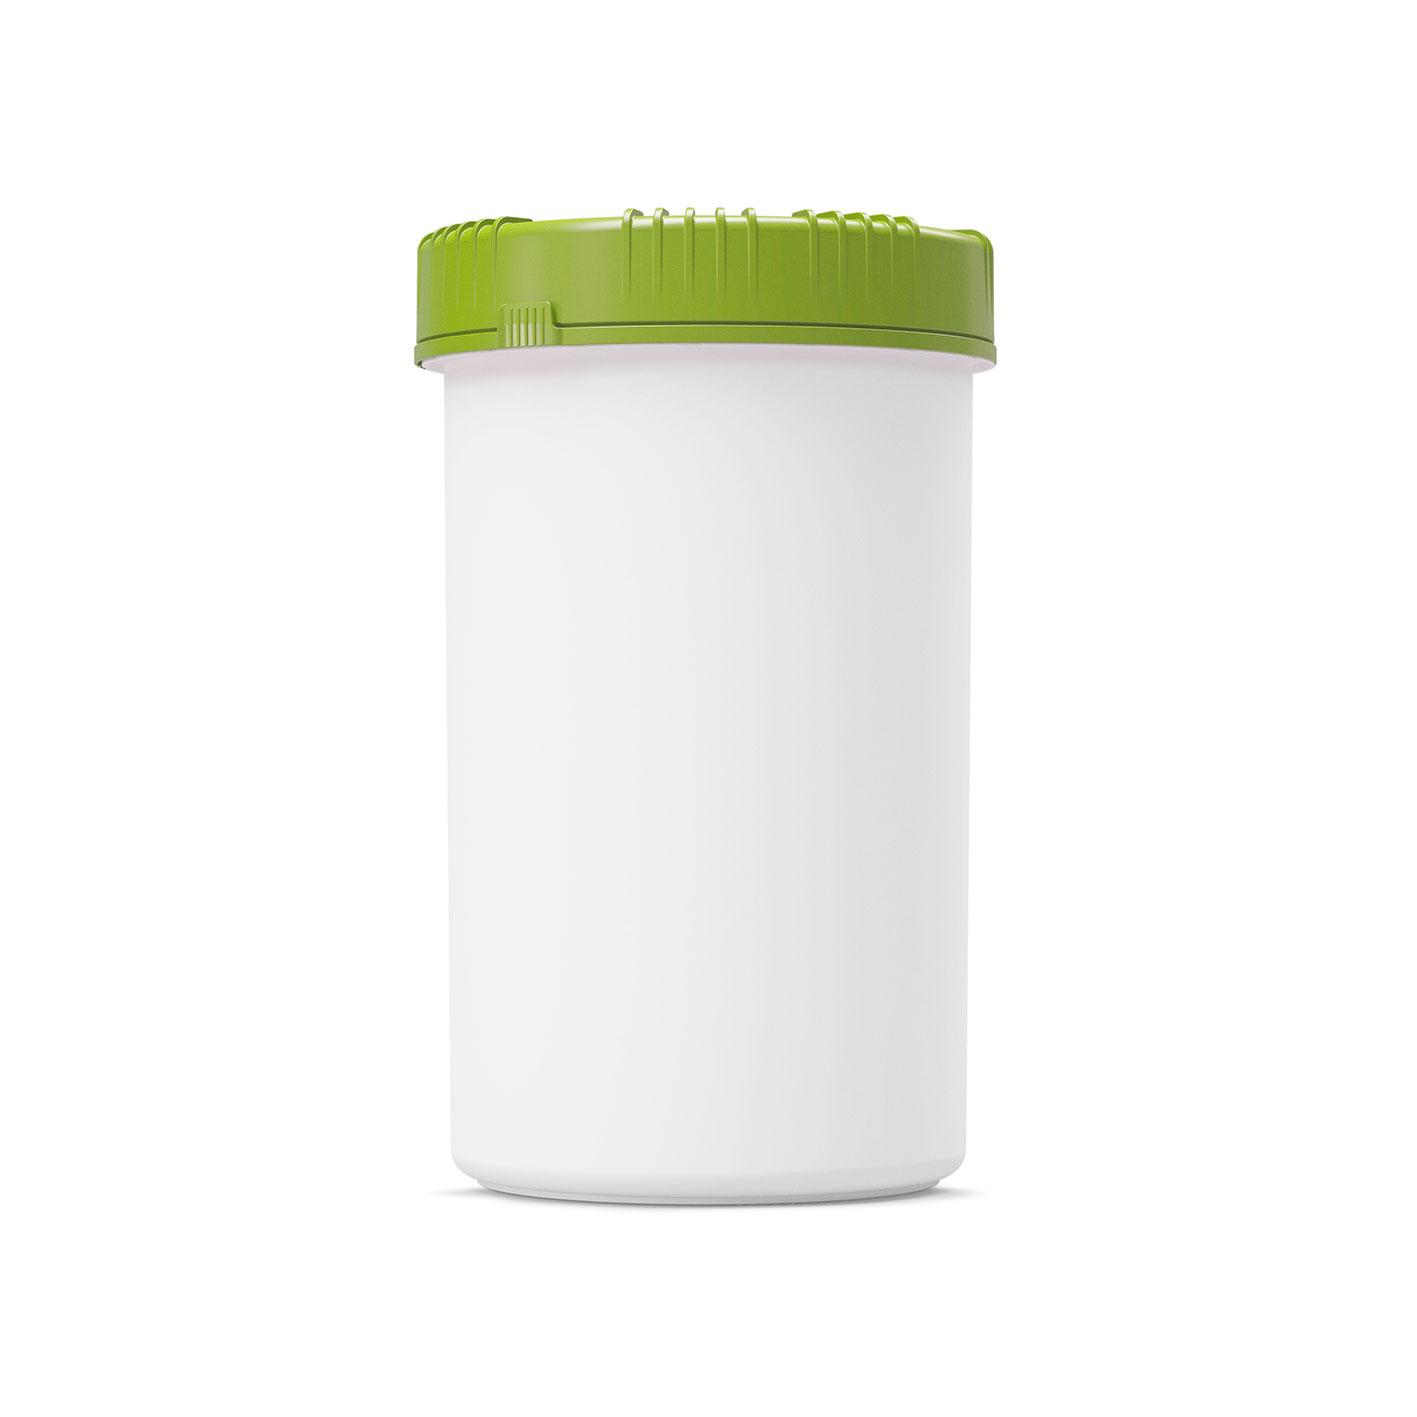 2000 ml Biobased Packo